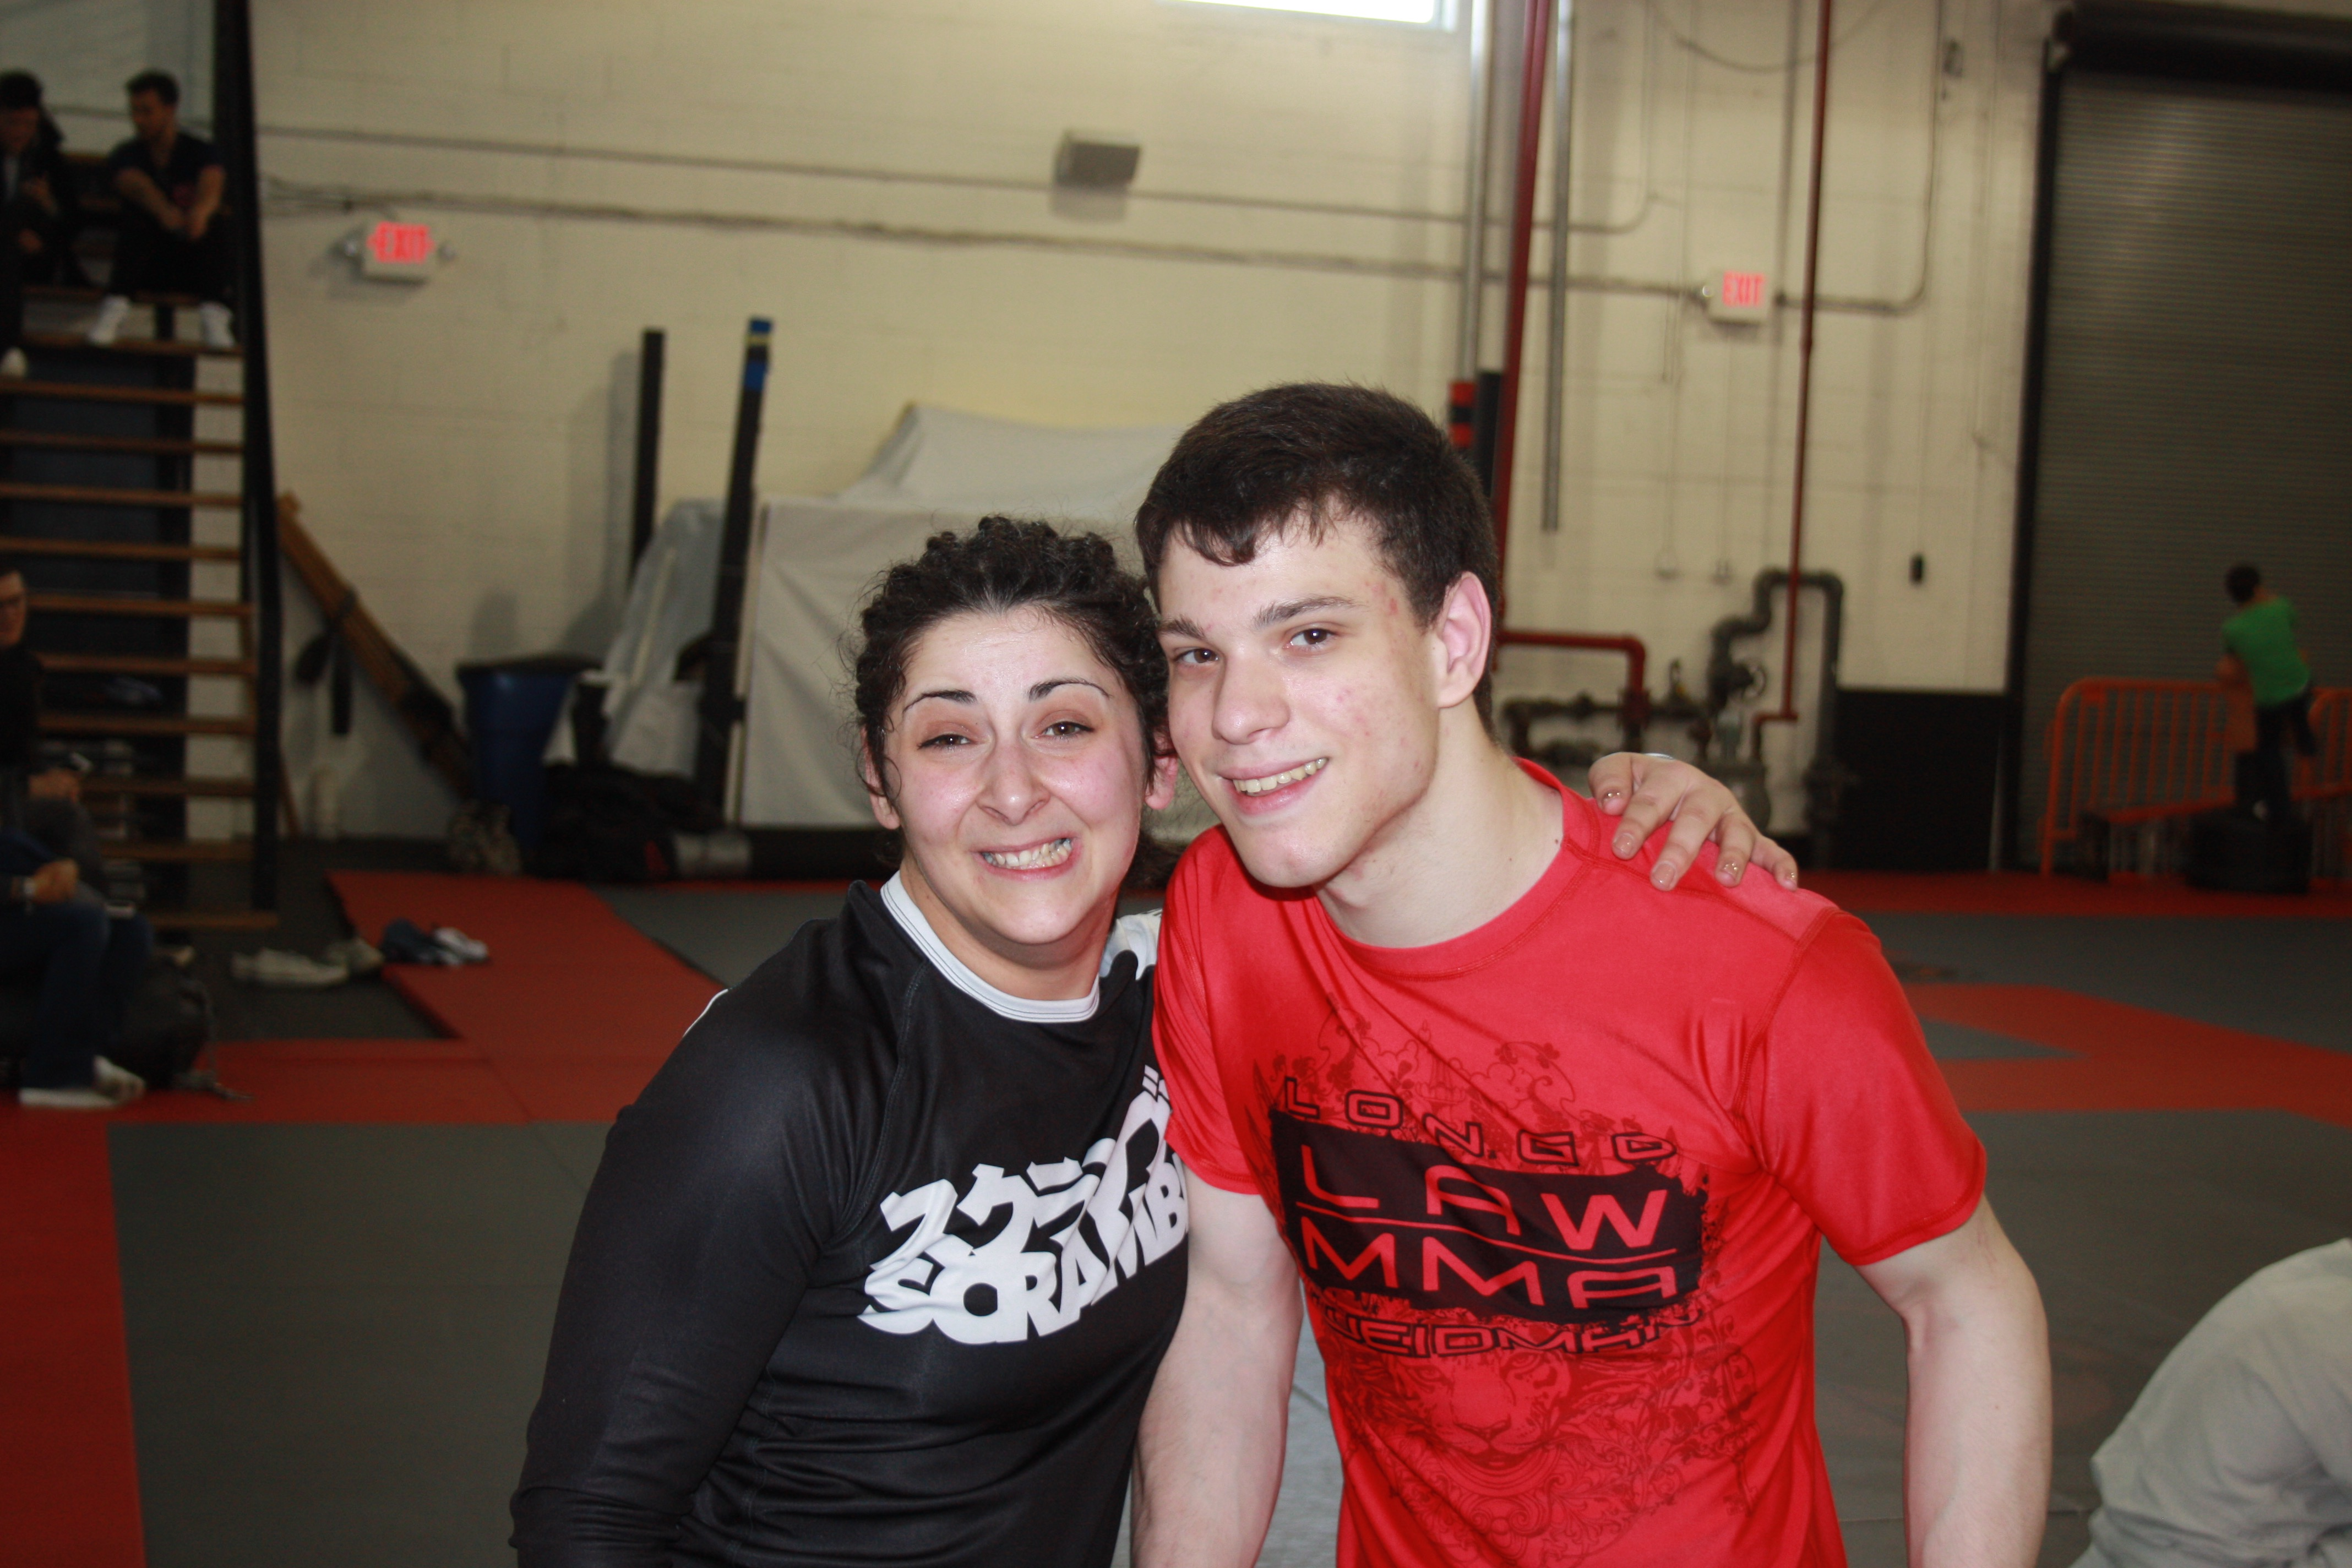 Gina and Ian